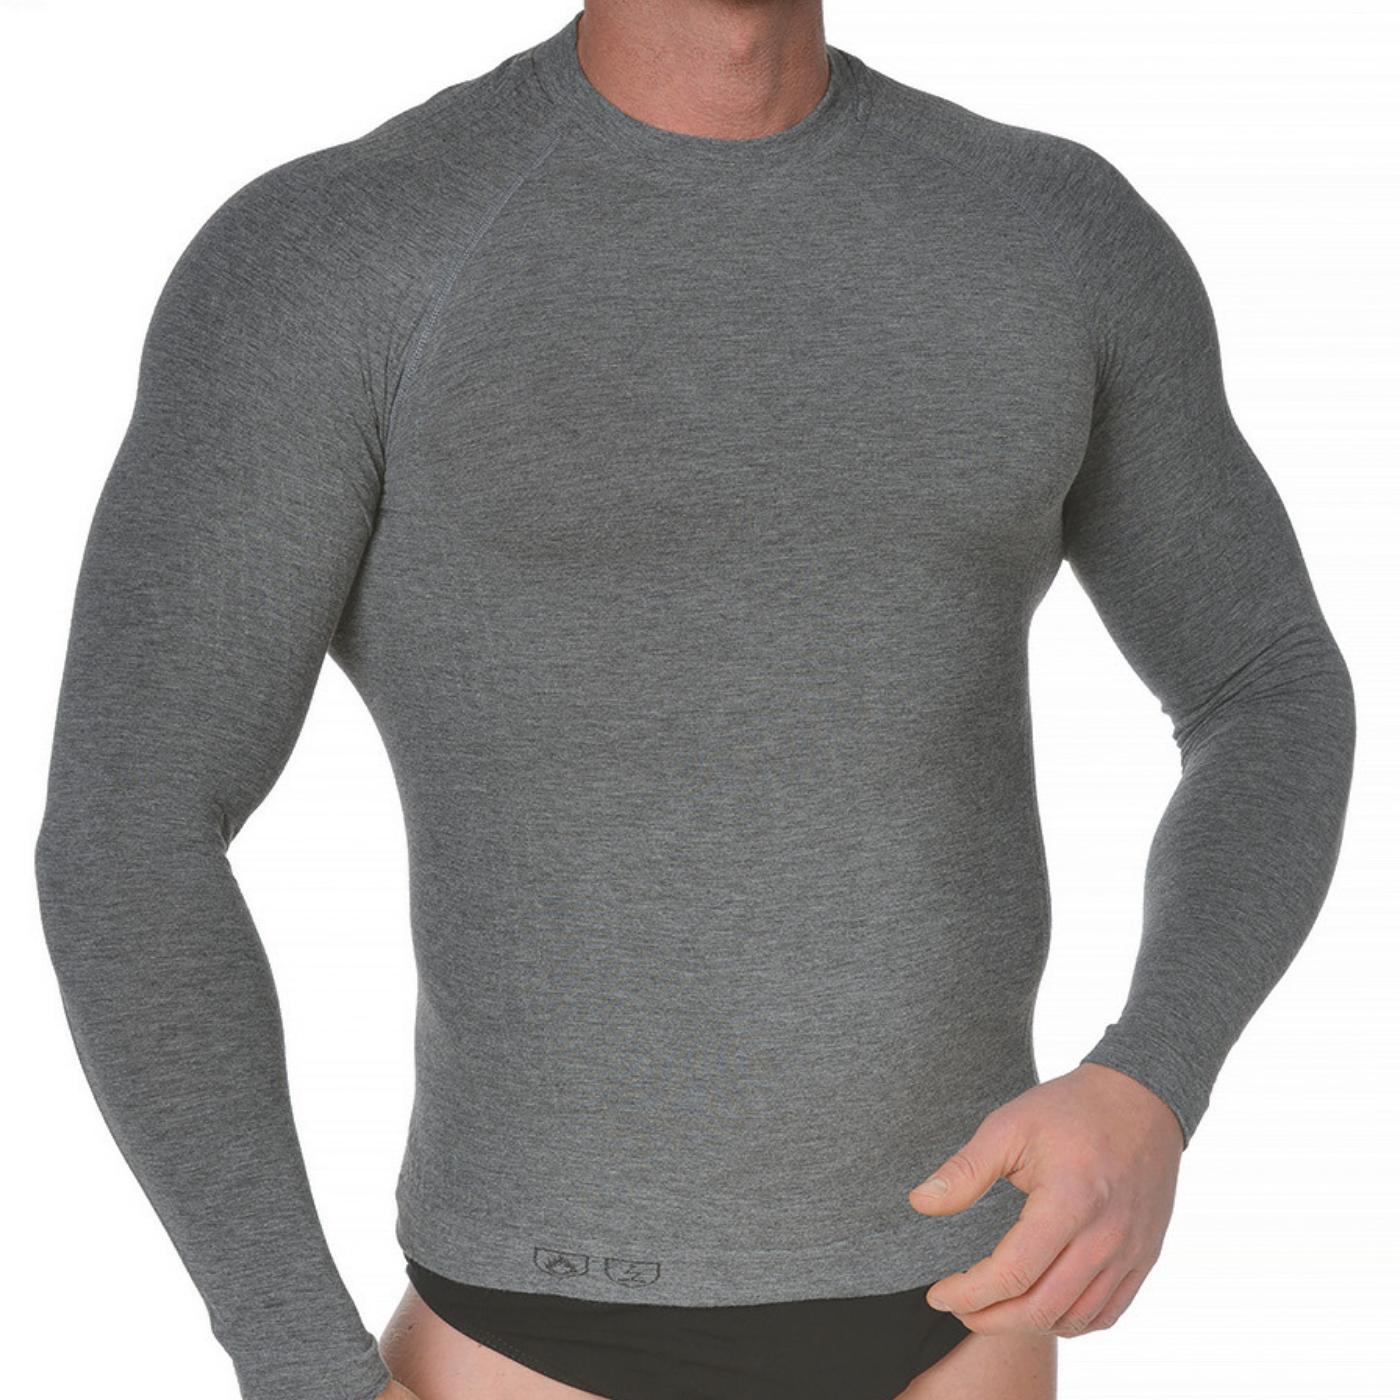 Koszulka termoaktywna z długim rękawem Gatta FR/AS GA Flame